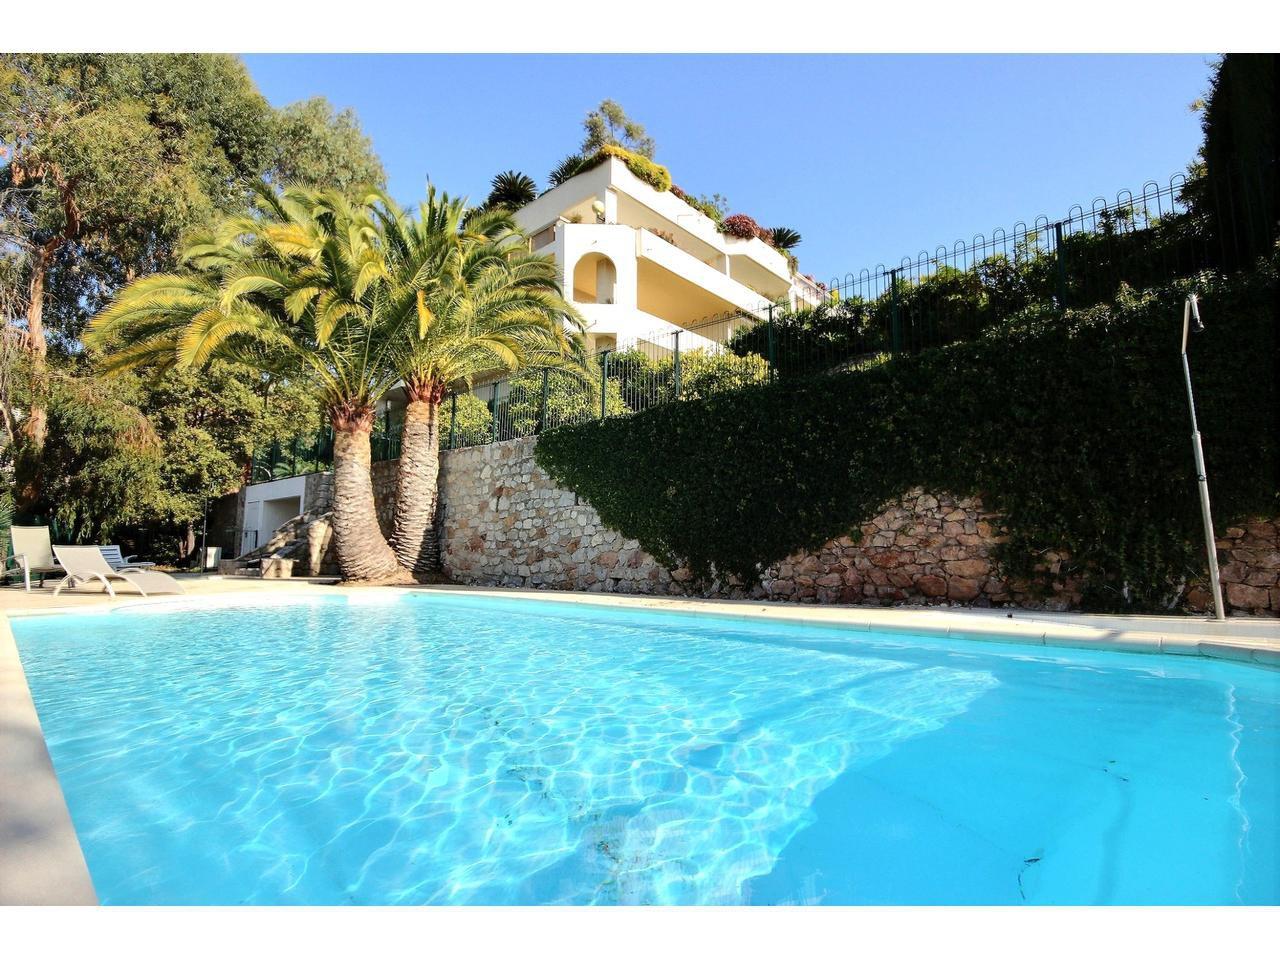 3 bedroom apartment for sale in Cannes Croix des Gardes